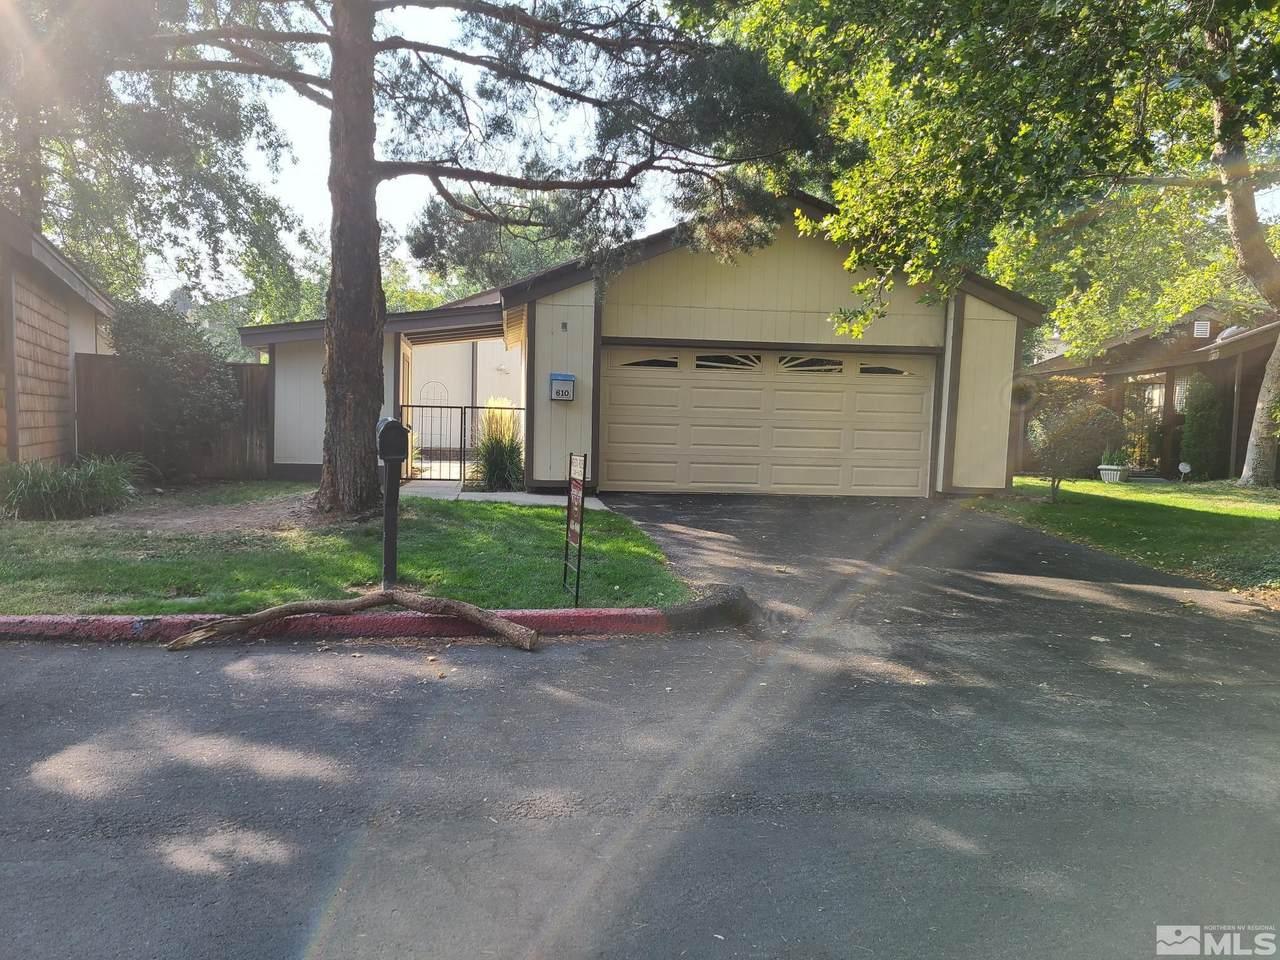 610 Riverview Circle - Photo 1